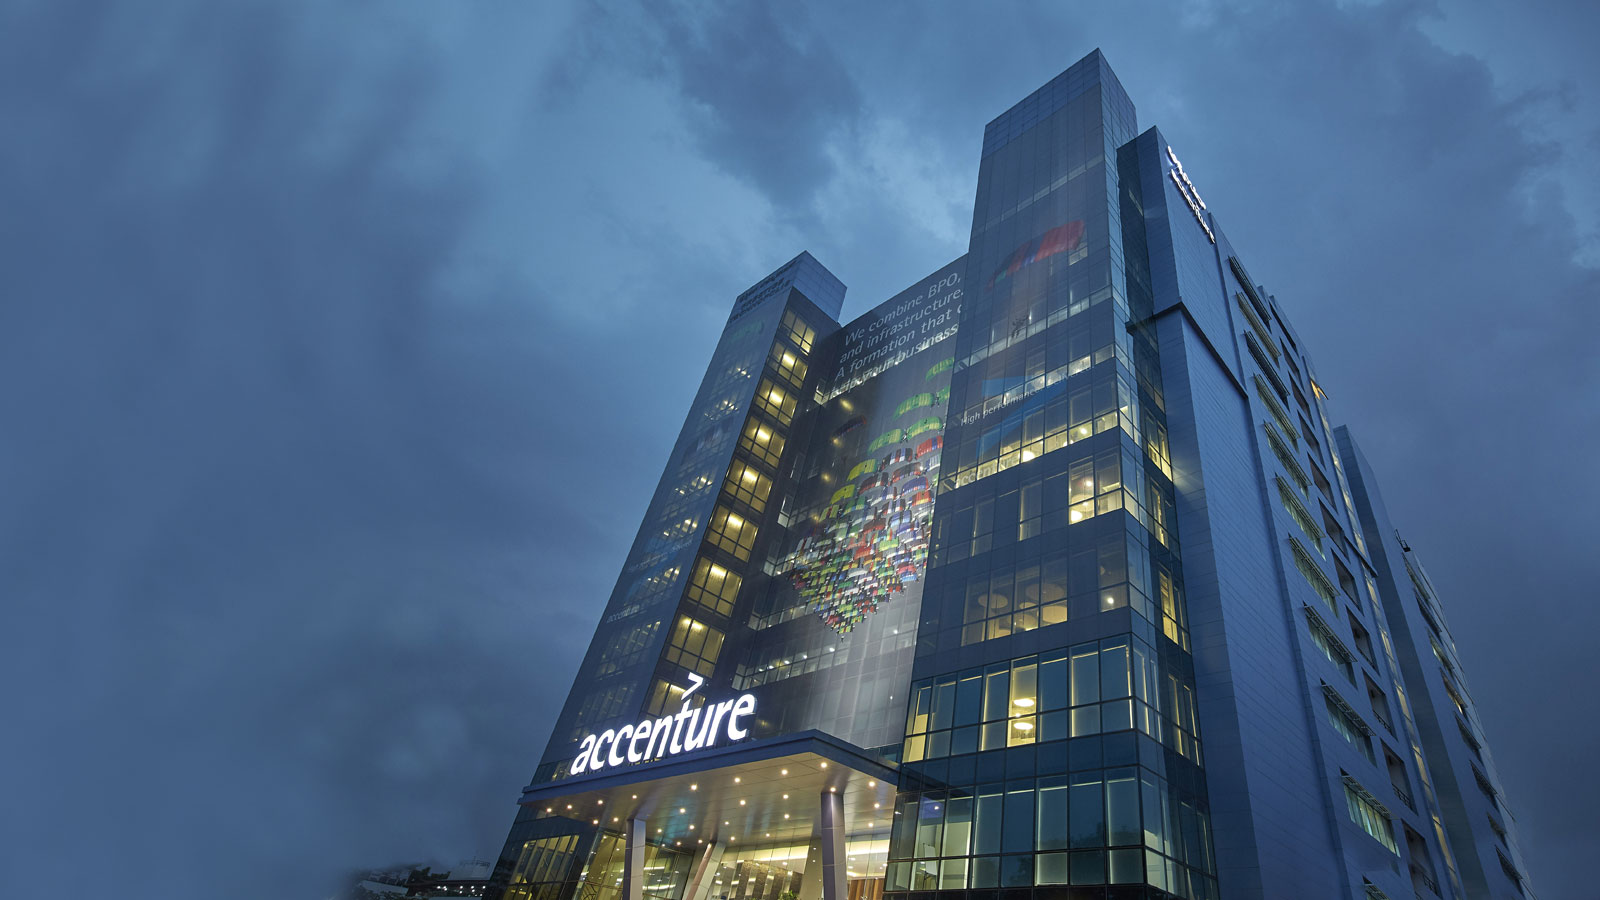 Accenture bangalore india address